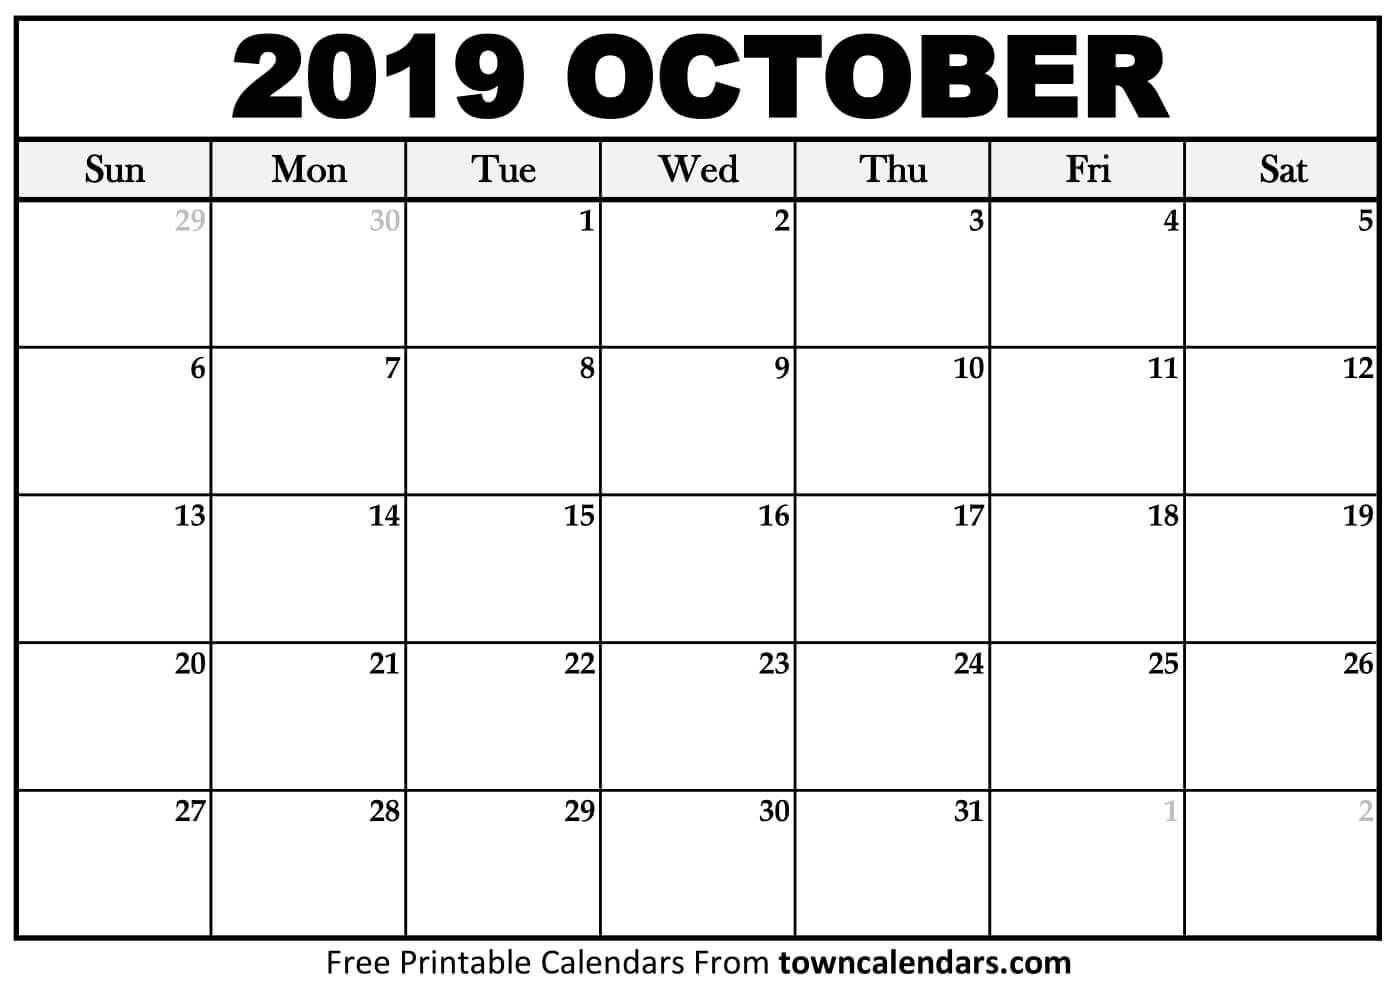 Printable October 2019 Calendar - Towncalendars with regard to Calendar 2019 October To December